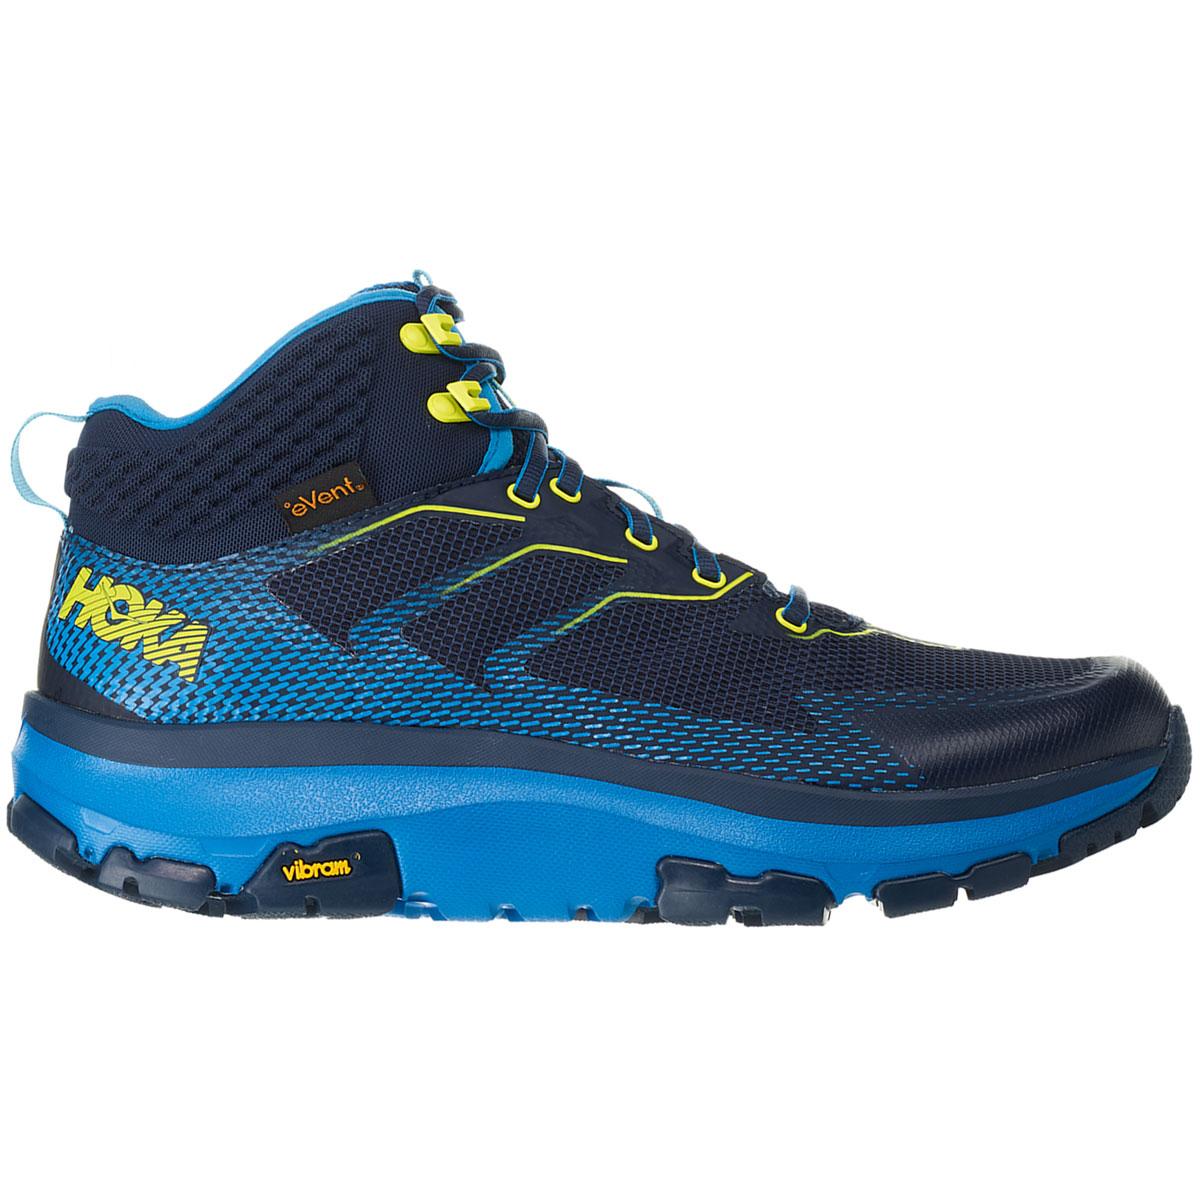 Men's Hoka One One Sky Toa Gore-Tex Trail Running Shoe - Color: Black Iris/Blue - Size: 7 - Width: Regular, Black Iris/Blue, large, image 1